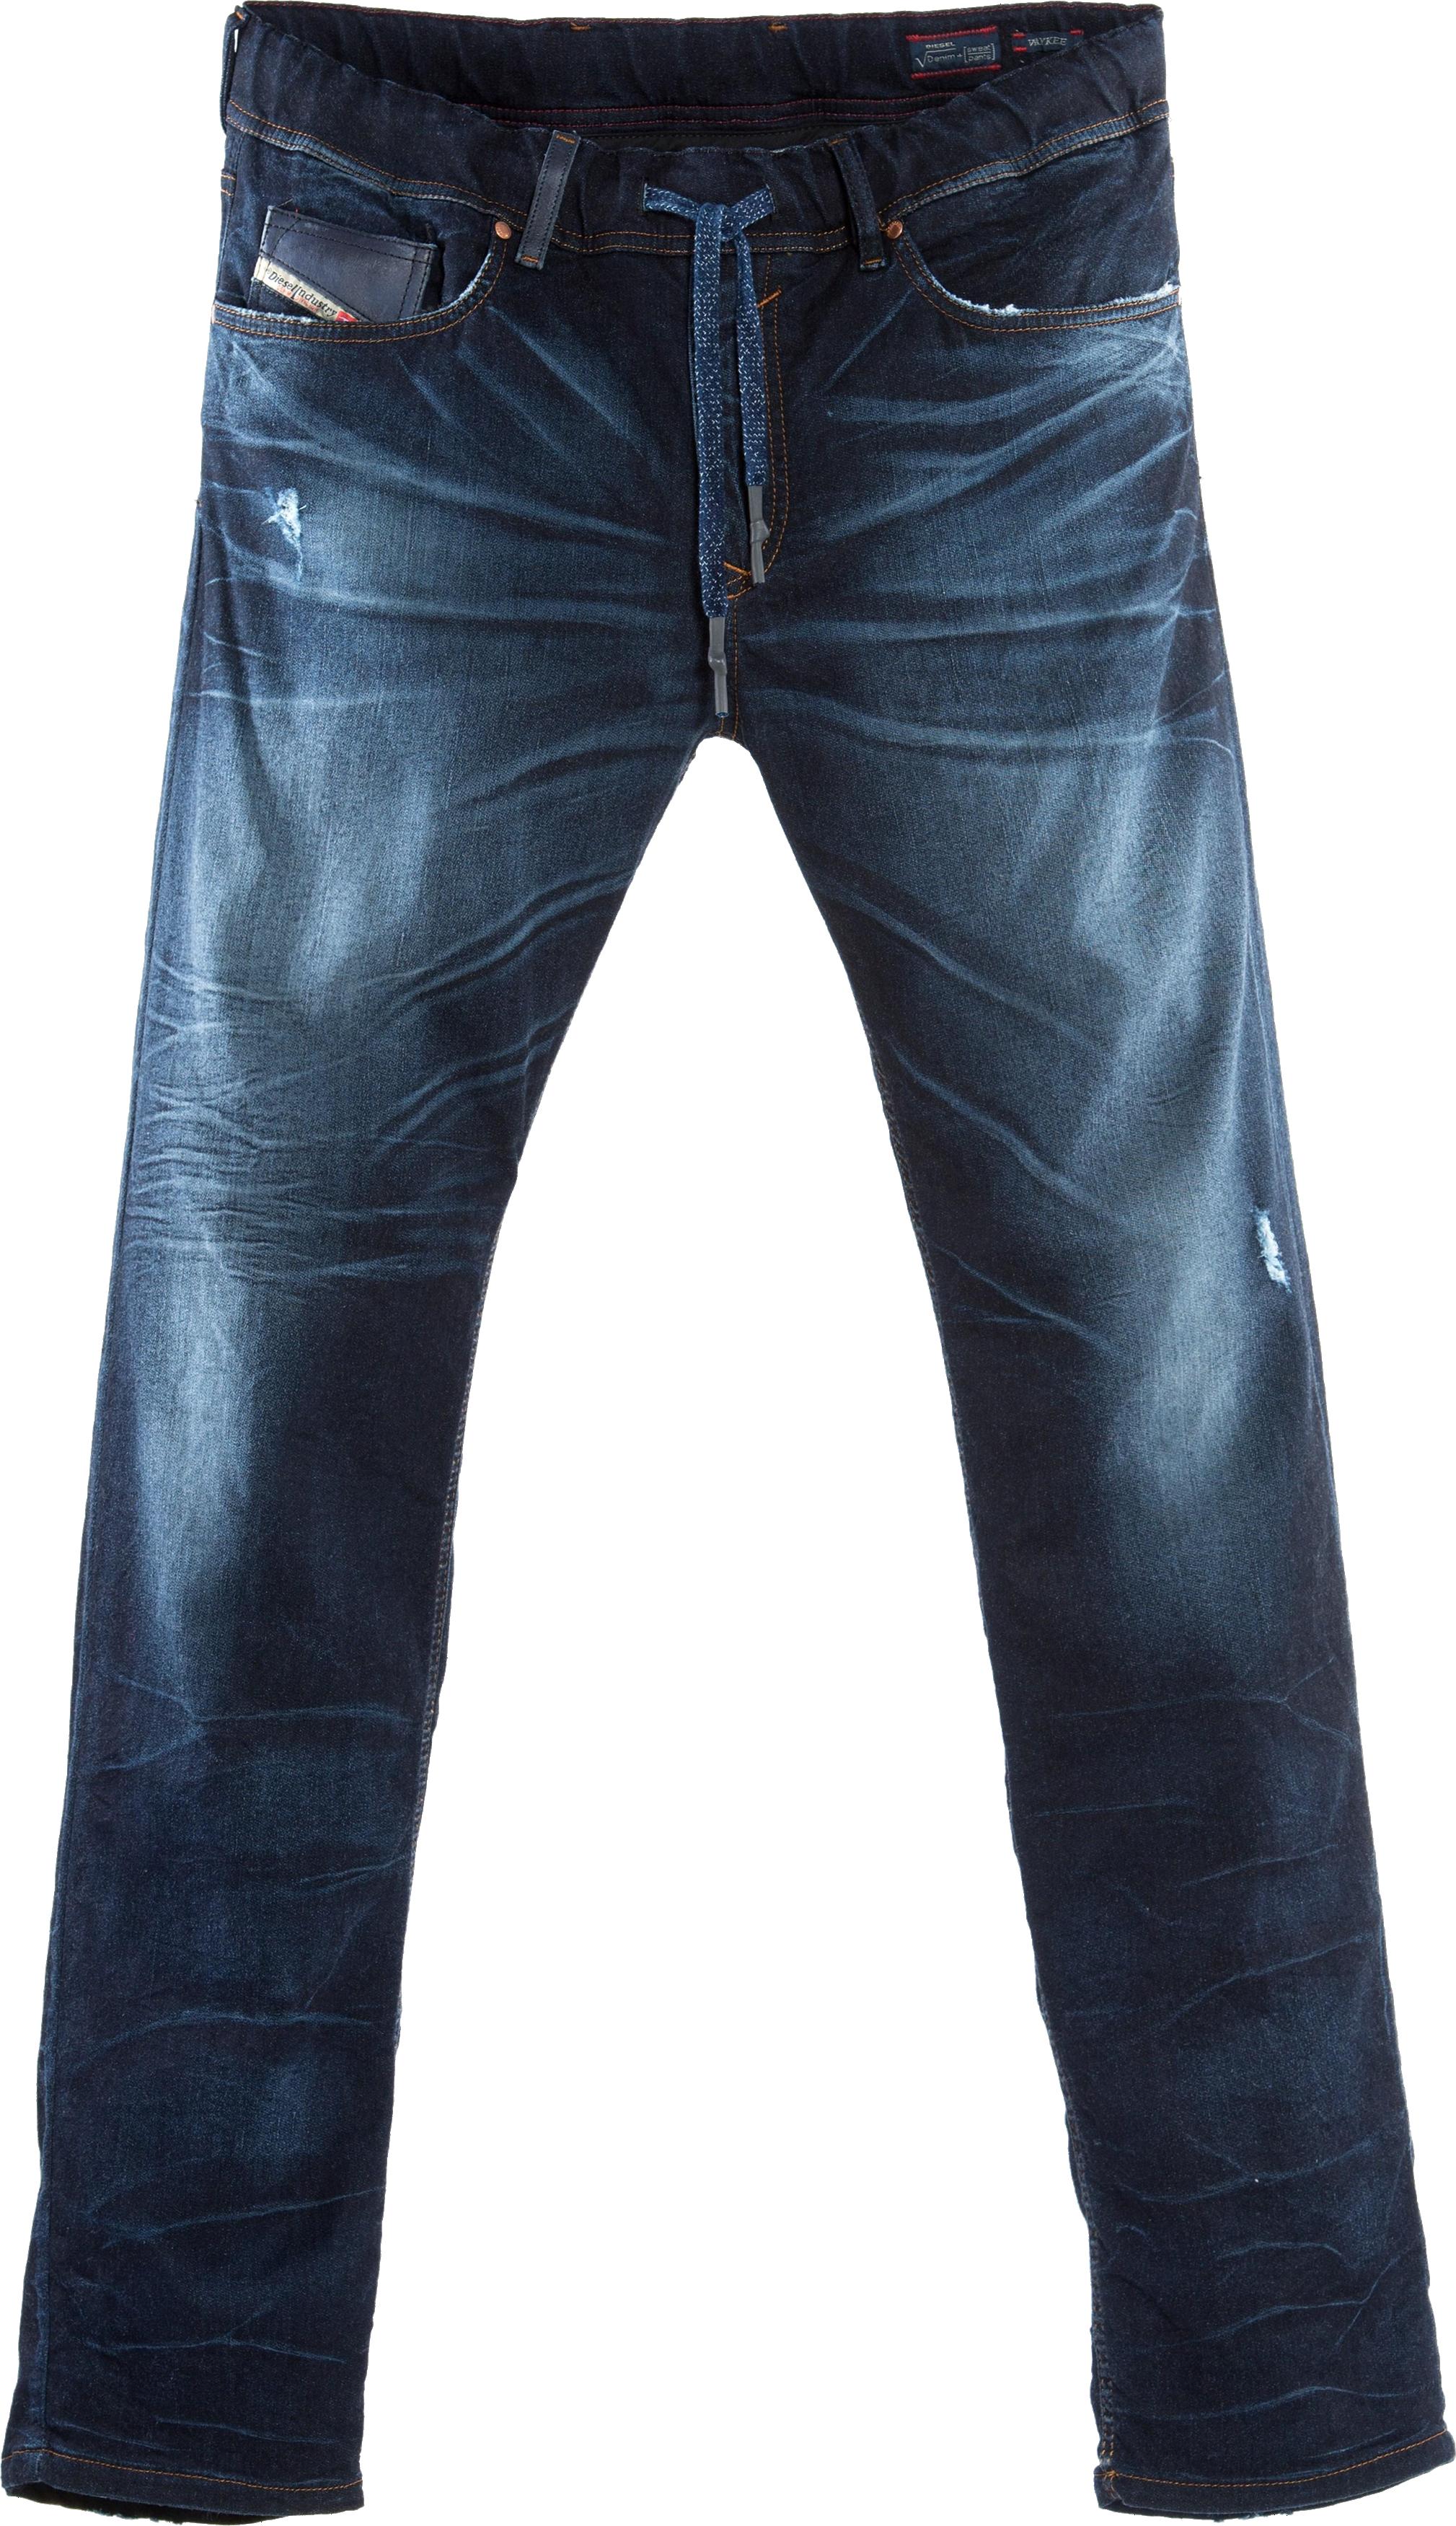 Men S Original Jeans Png Image Calca Masculina Masculino Calca